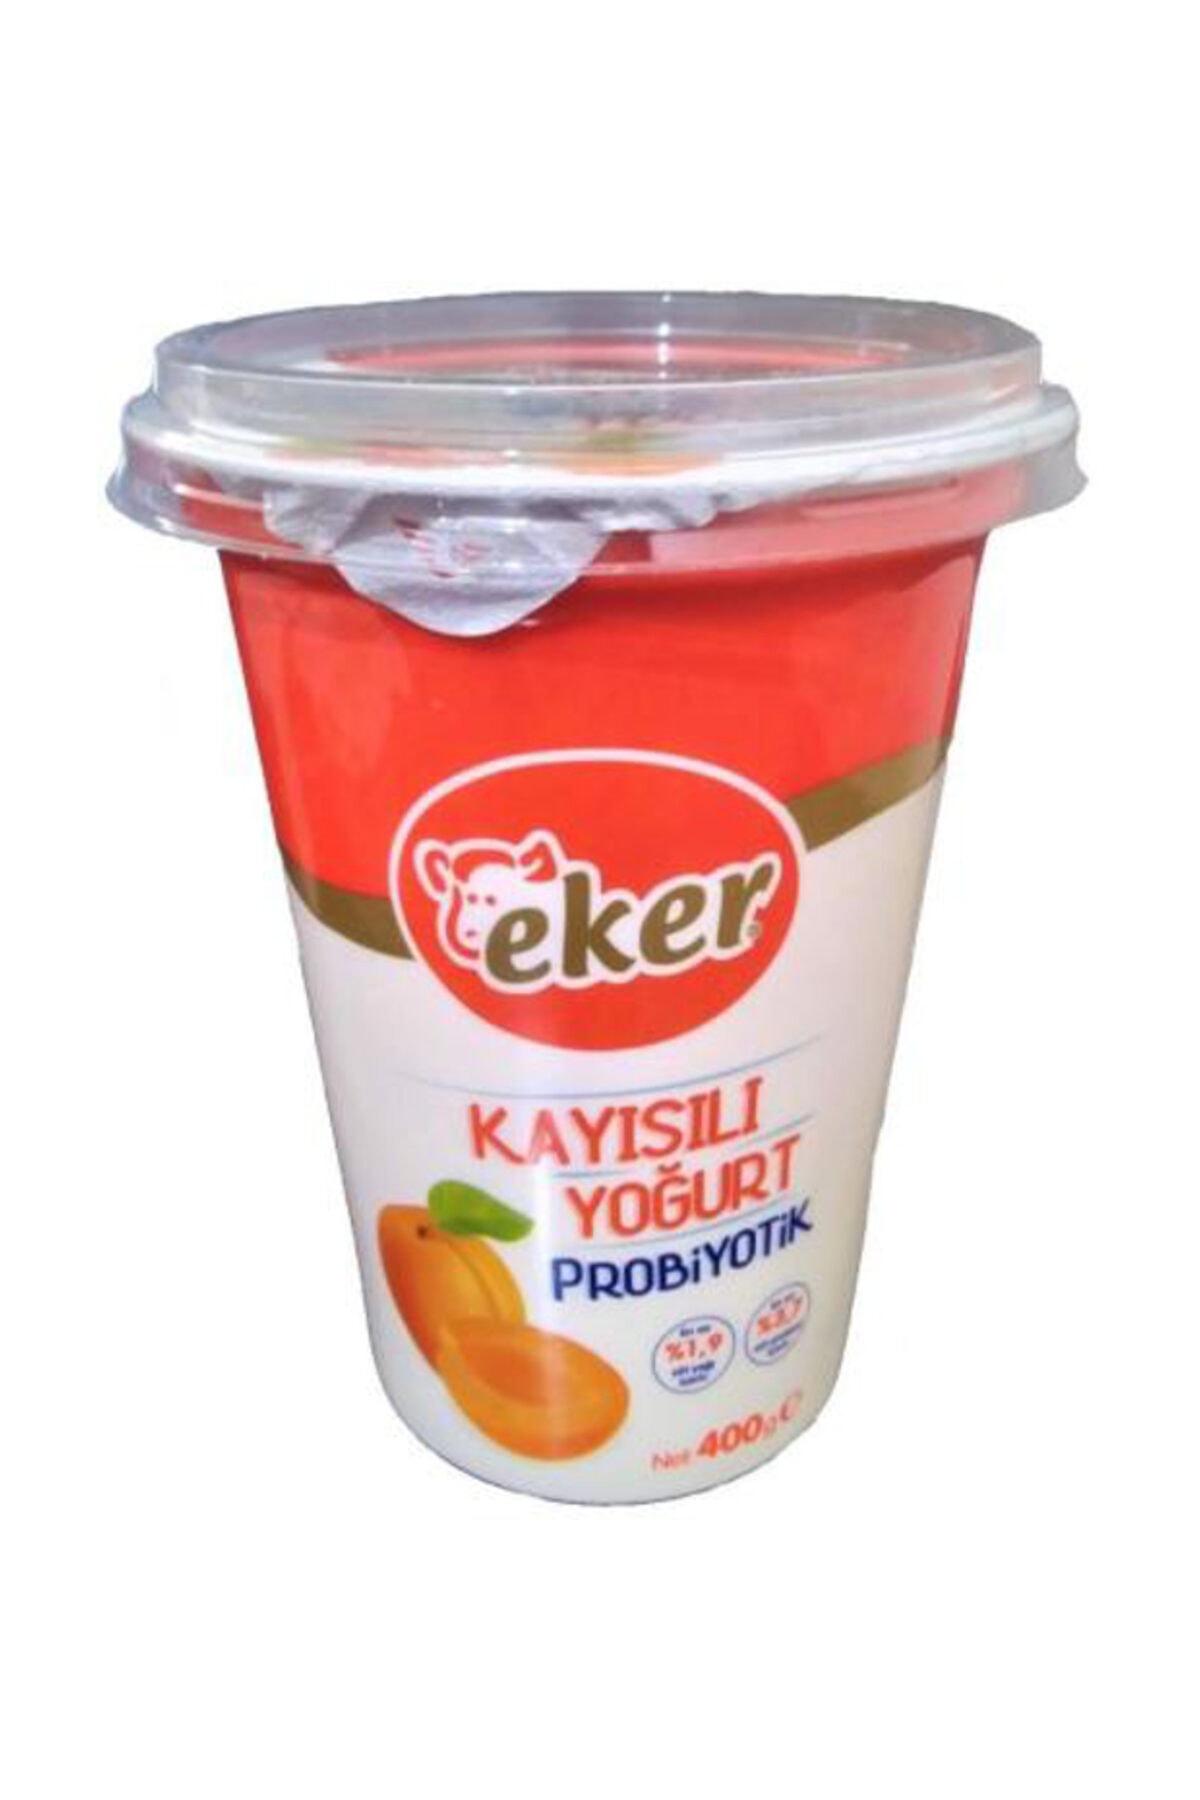 EKER PROBIYOTIK KAYISILI YOGURT 400 GR